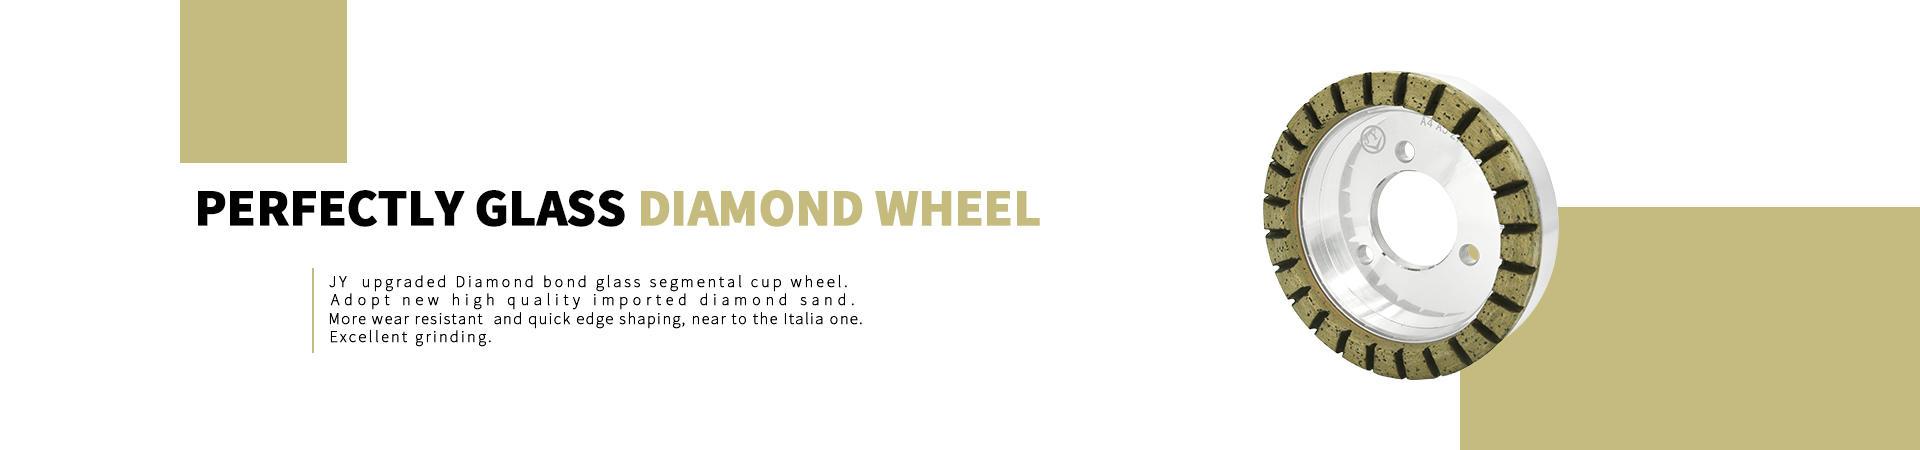 category-Best Cup Grinding Wheel Flaring Cup Wheel   Jy-JY-img